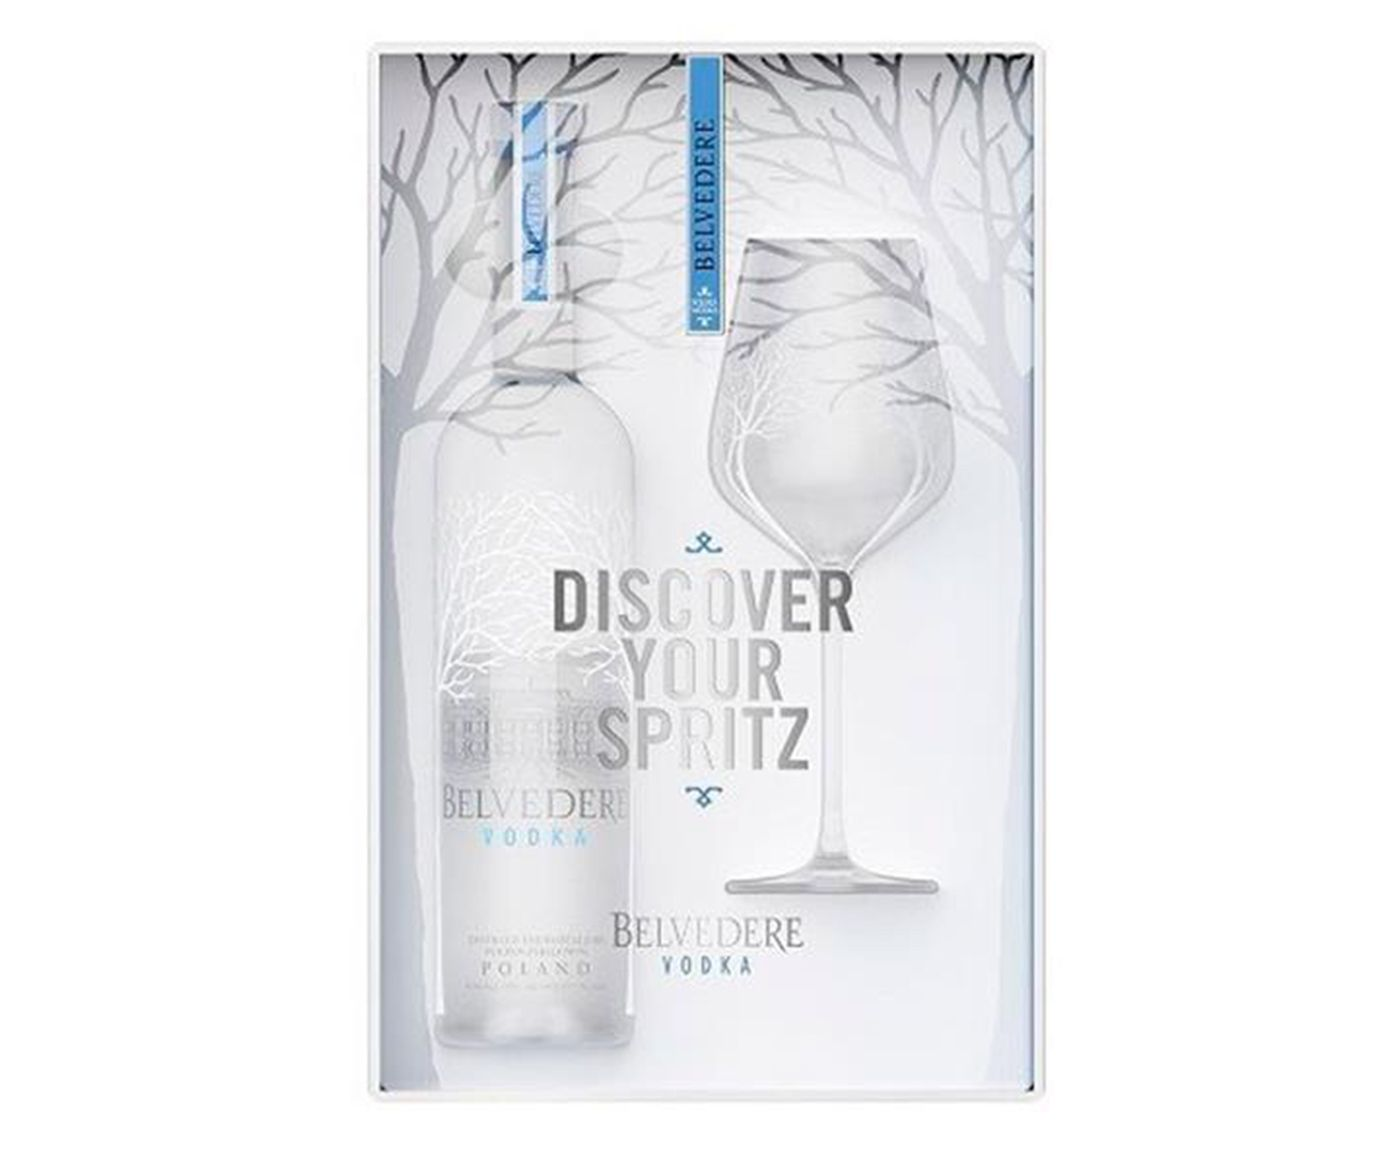 Vodka Belvedere Pure Spritz Glass - 700ml   Westwing.com.br